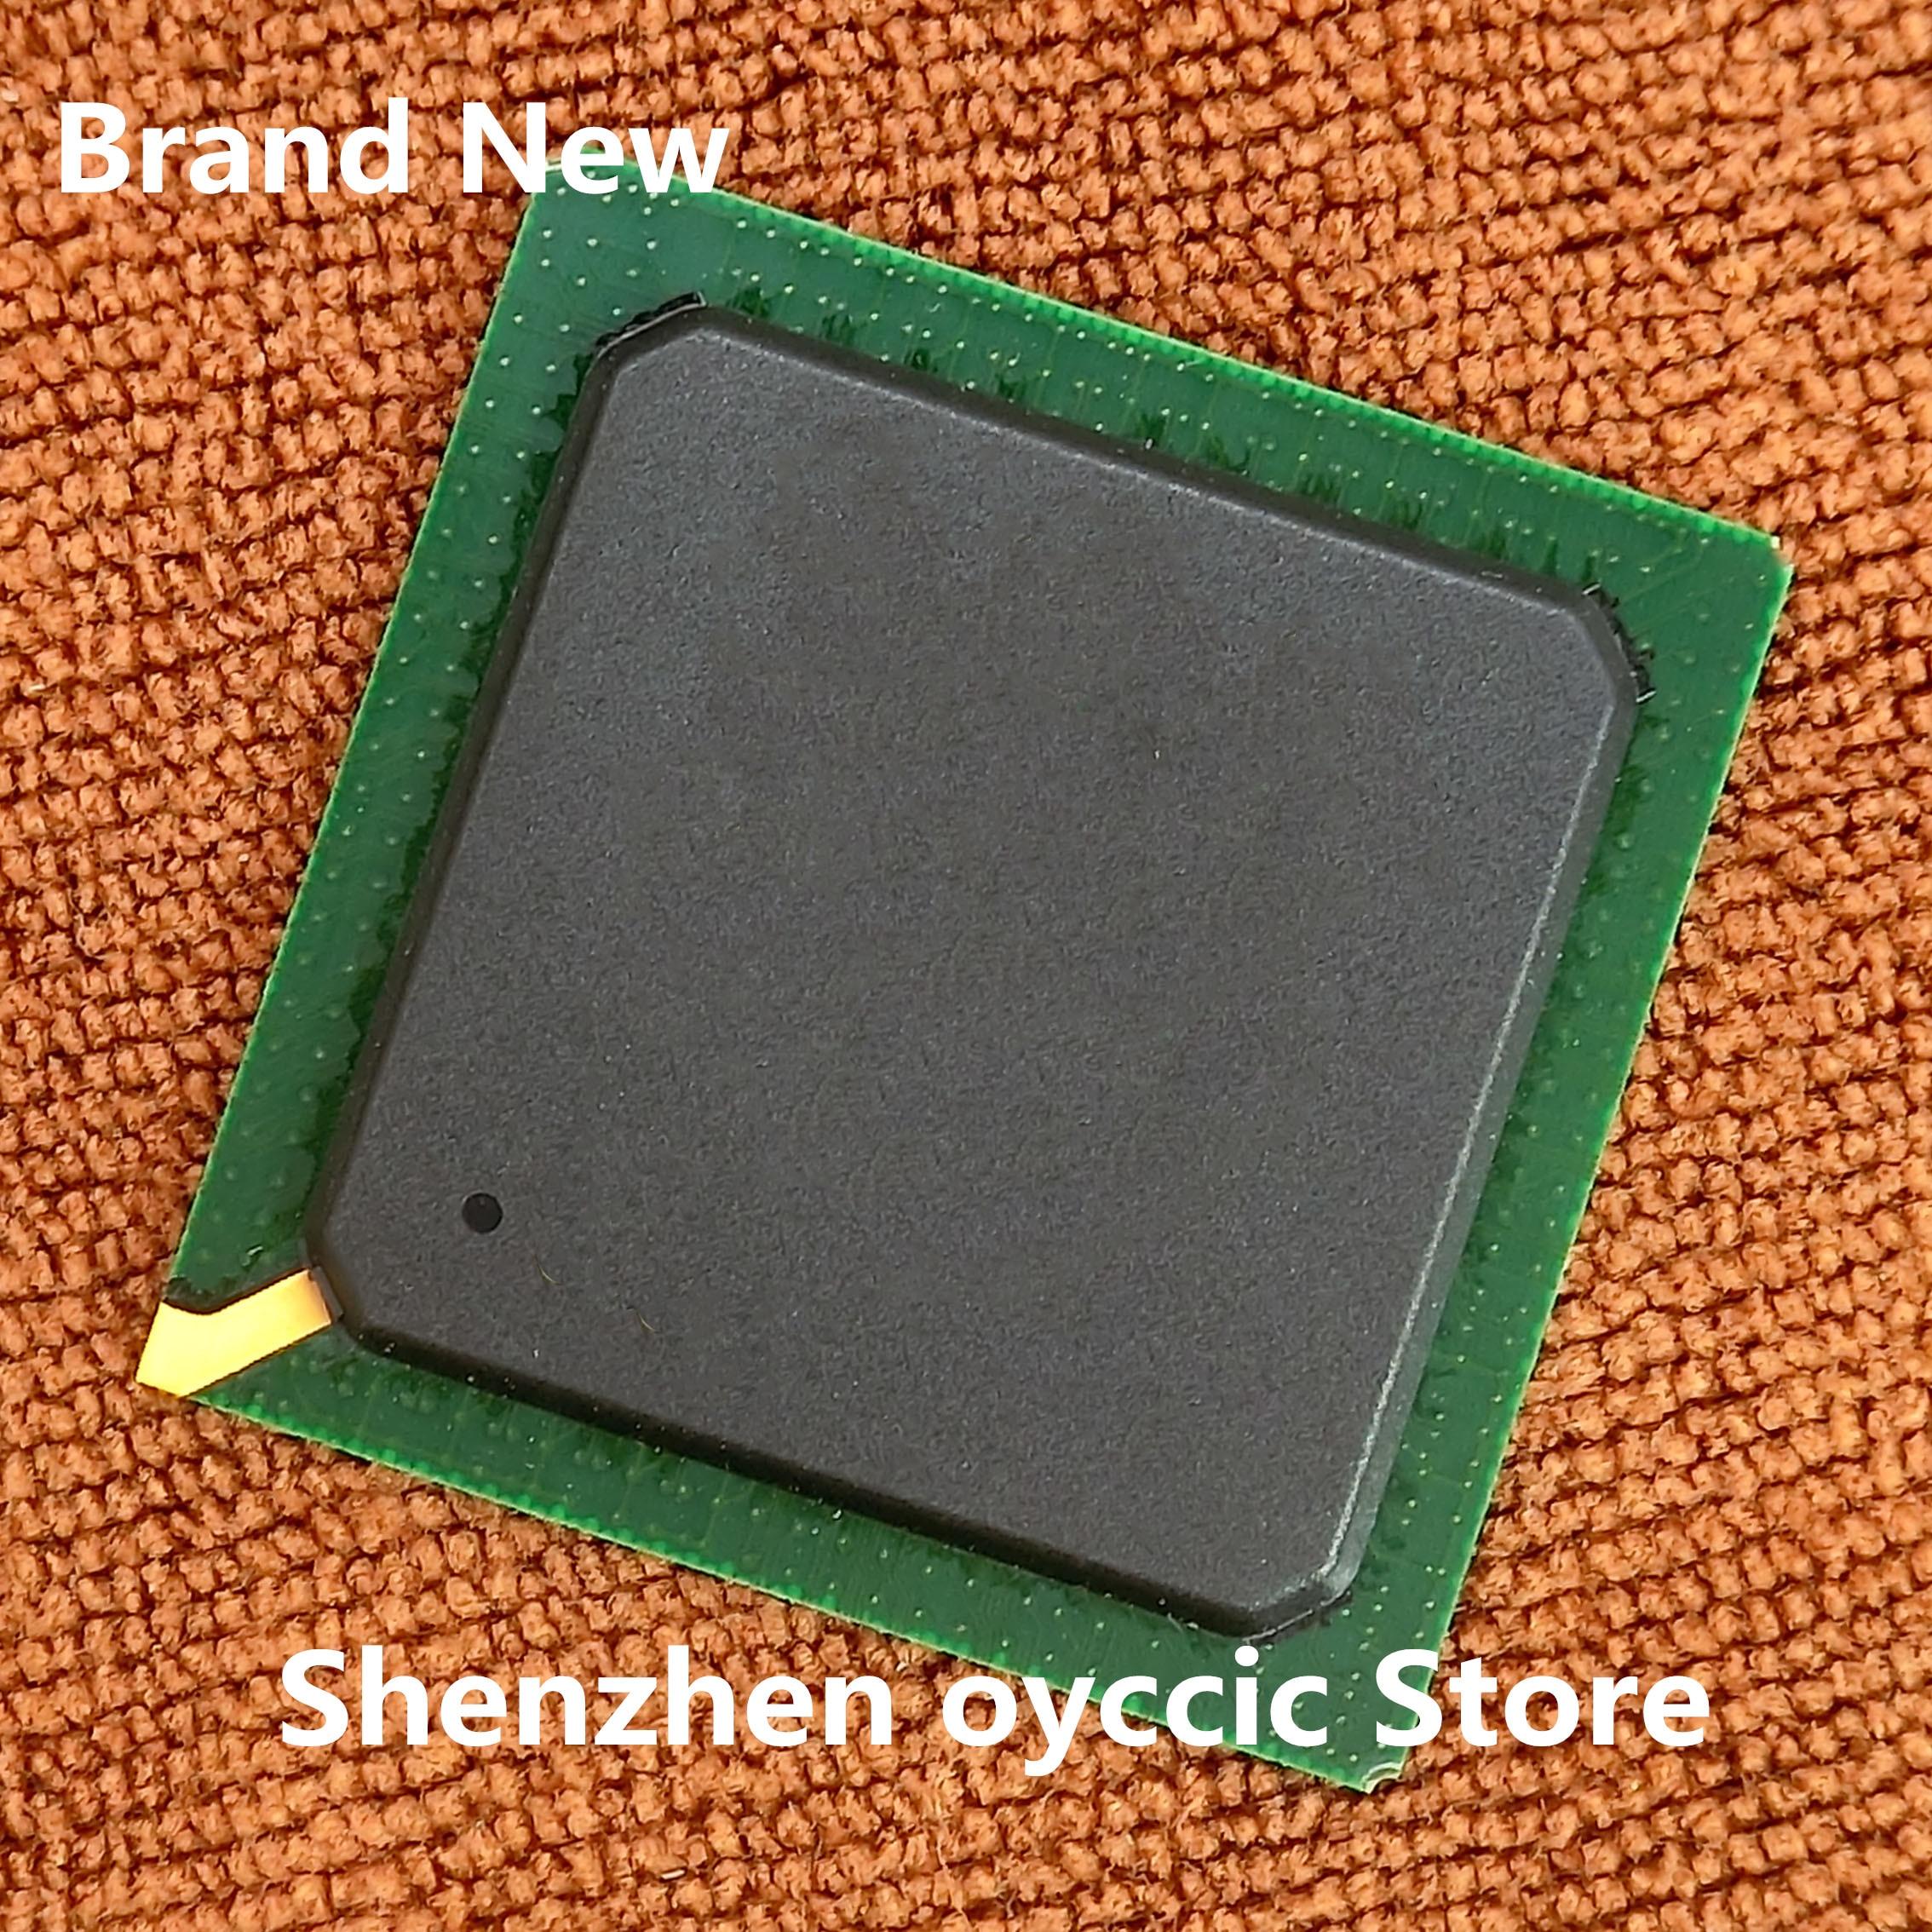 1 peças * Brand New FW82801EB FW82801DB FW82801FB FW82801ER FW82801FR NH82801HR NH82801IR NH82801ER NH82801FR Chipset BGA IC